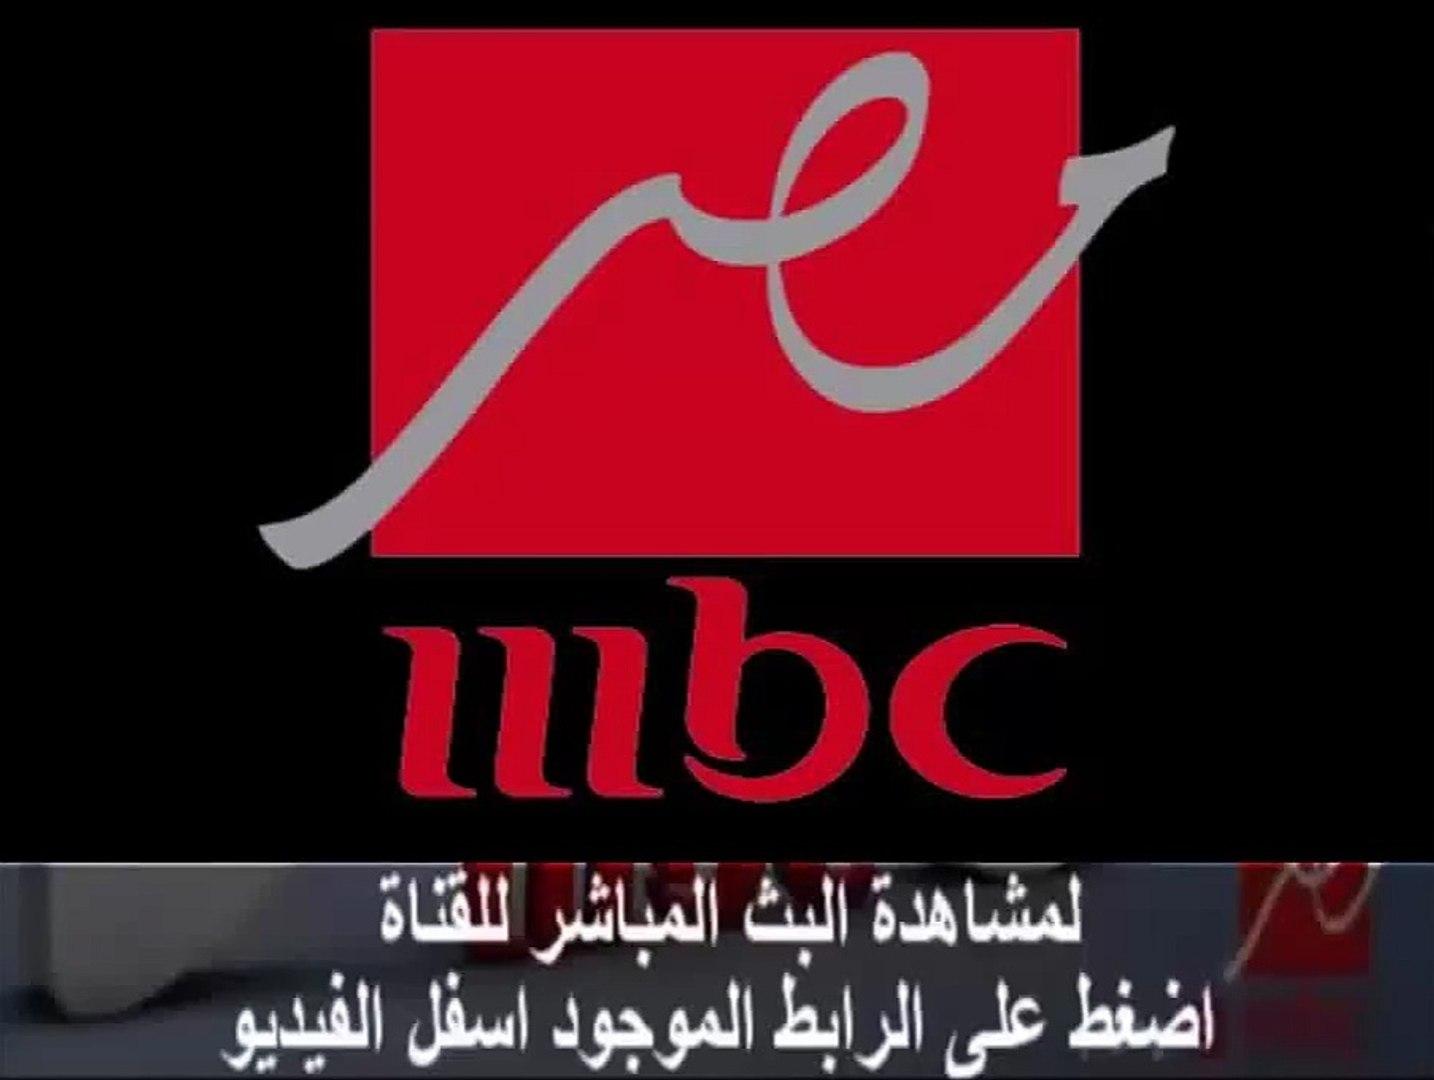 مشاهدة قناة ام بي سي مصر بث مباشر Mbc Masr اون لاين Hd